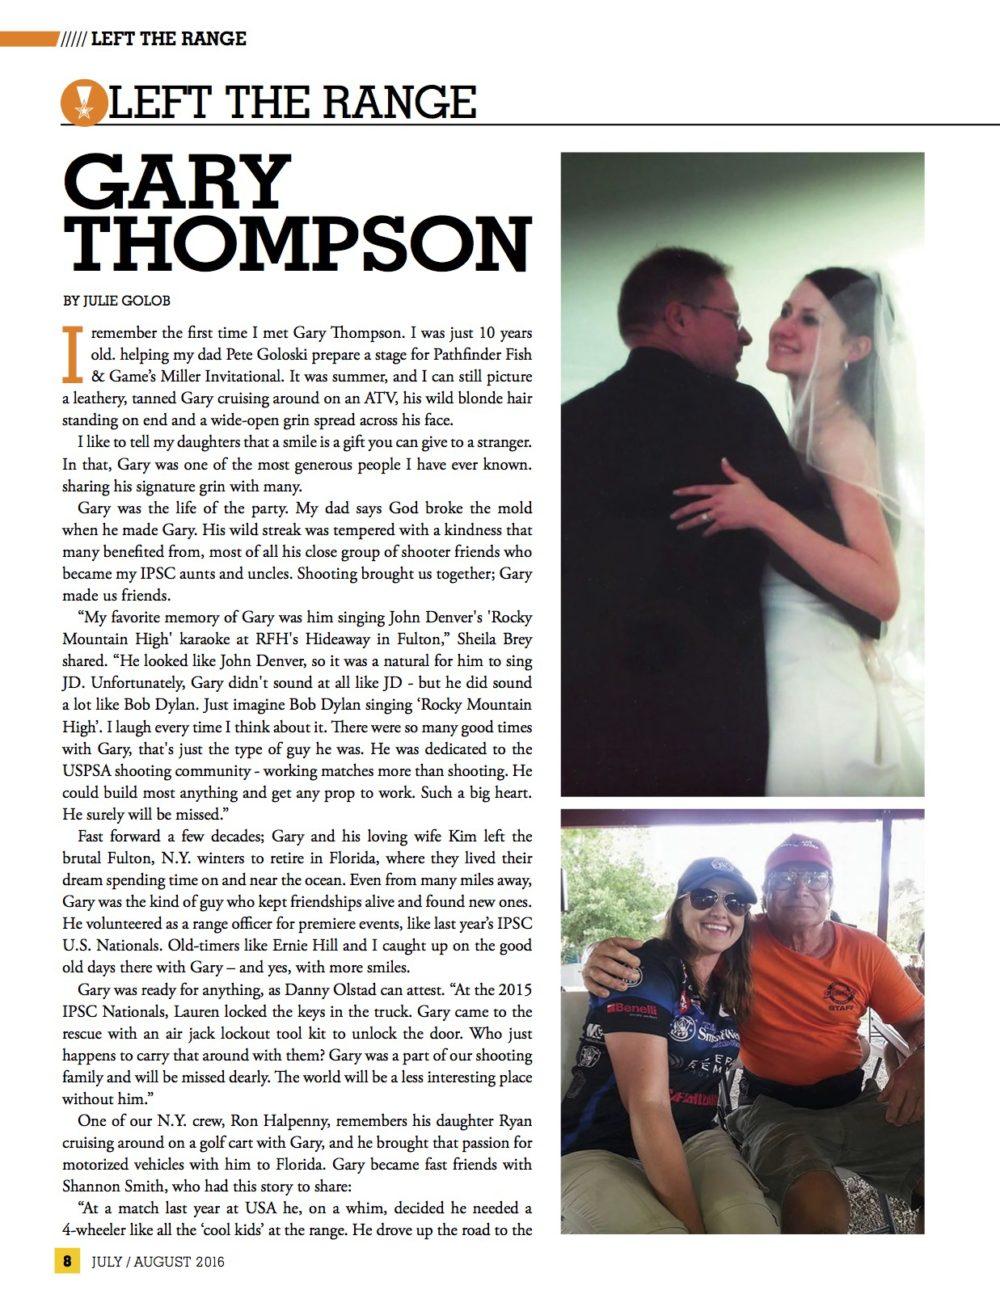 In loving memory… RIP Gary Thompson – Julie Golob